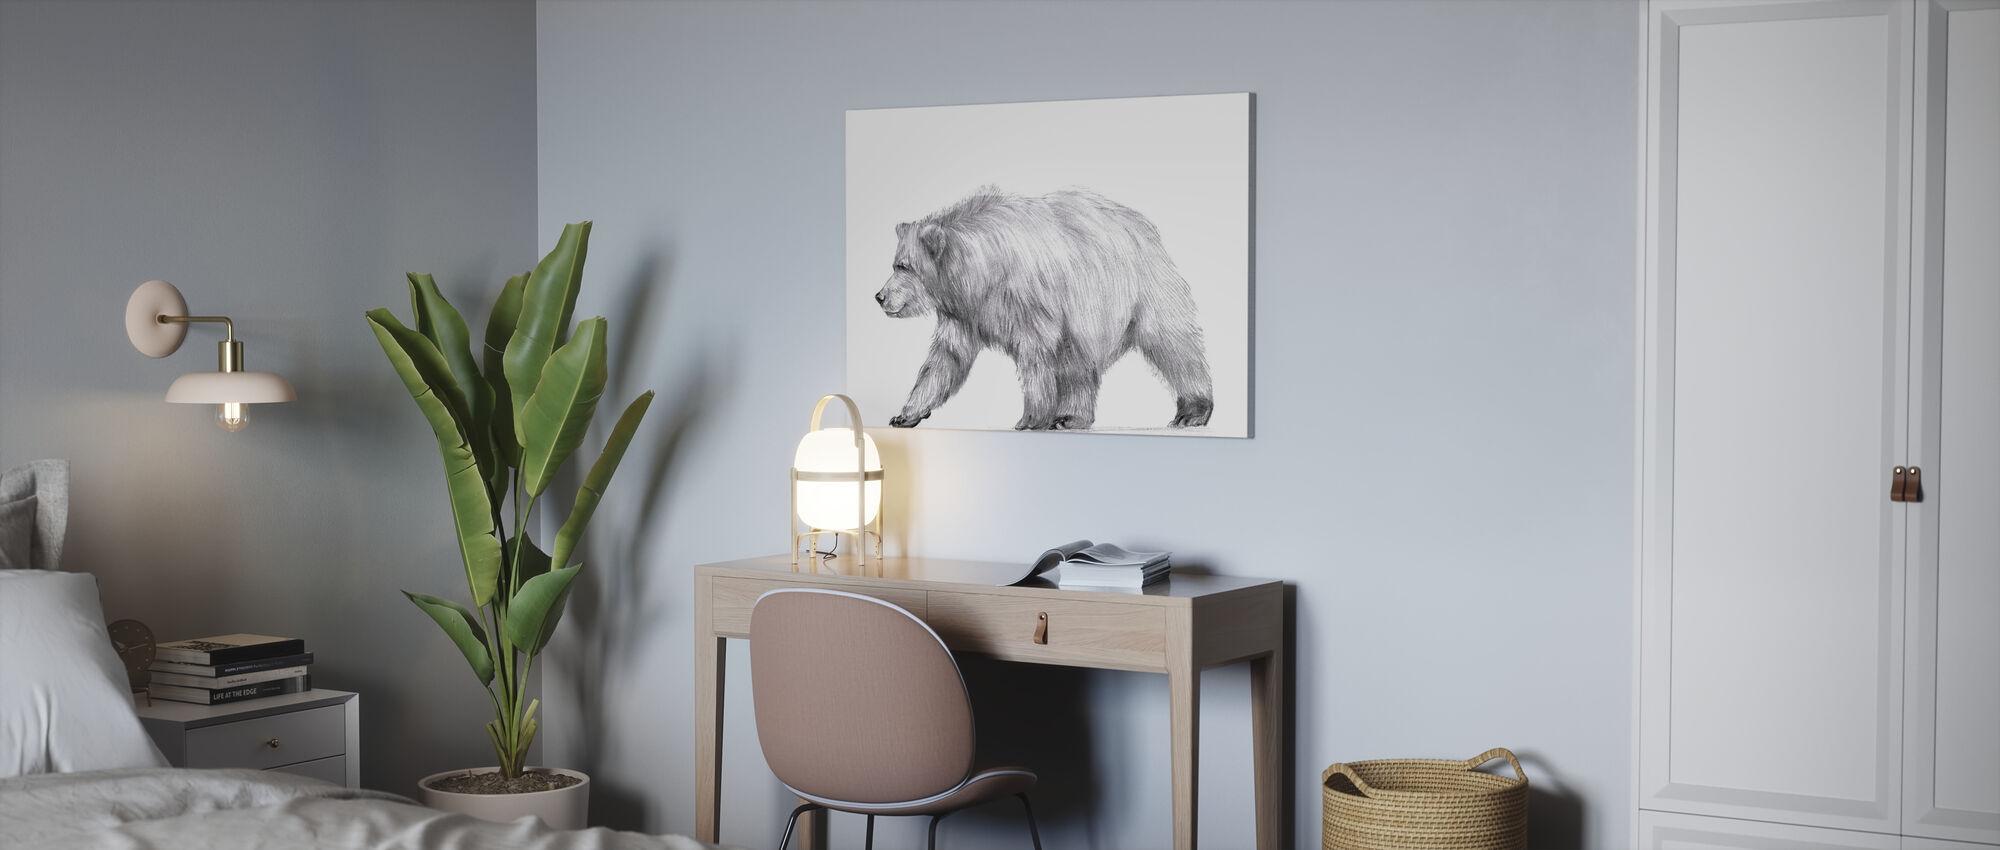 Wildlife Trail II - Canvas print - Office